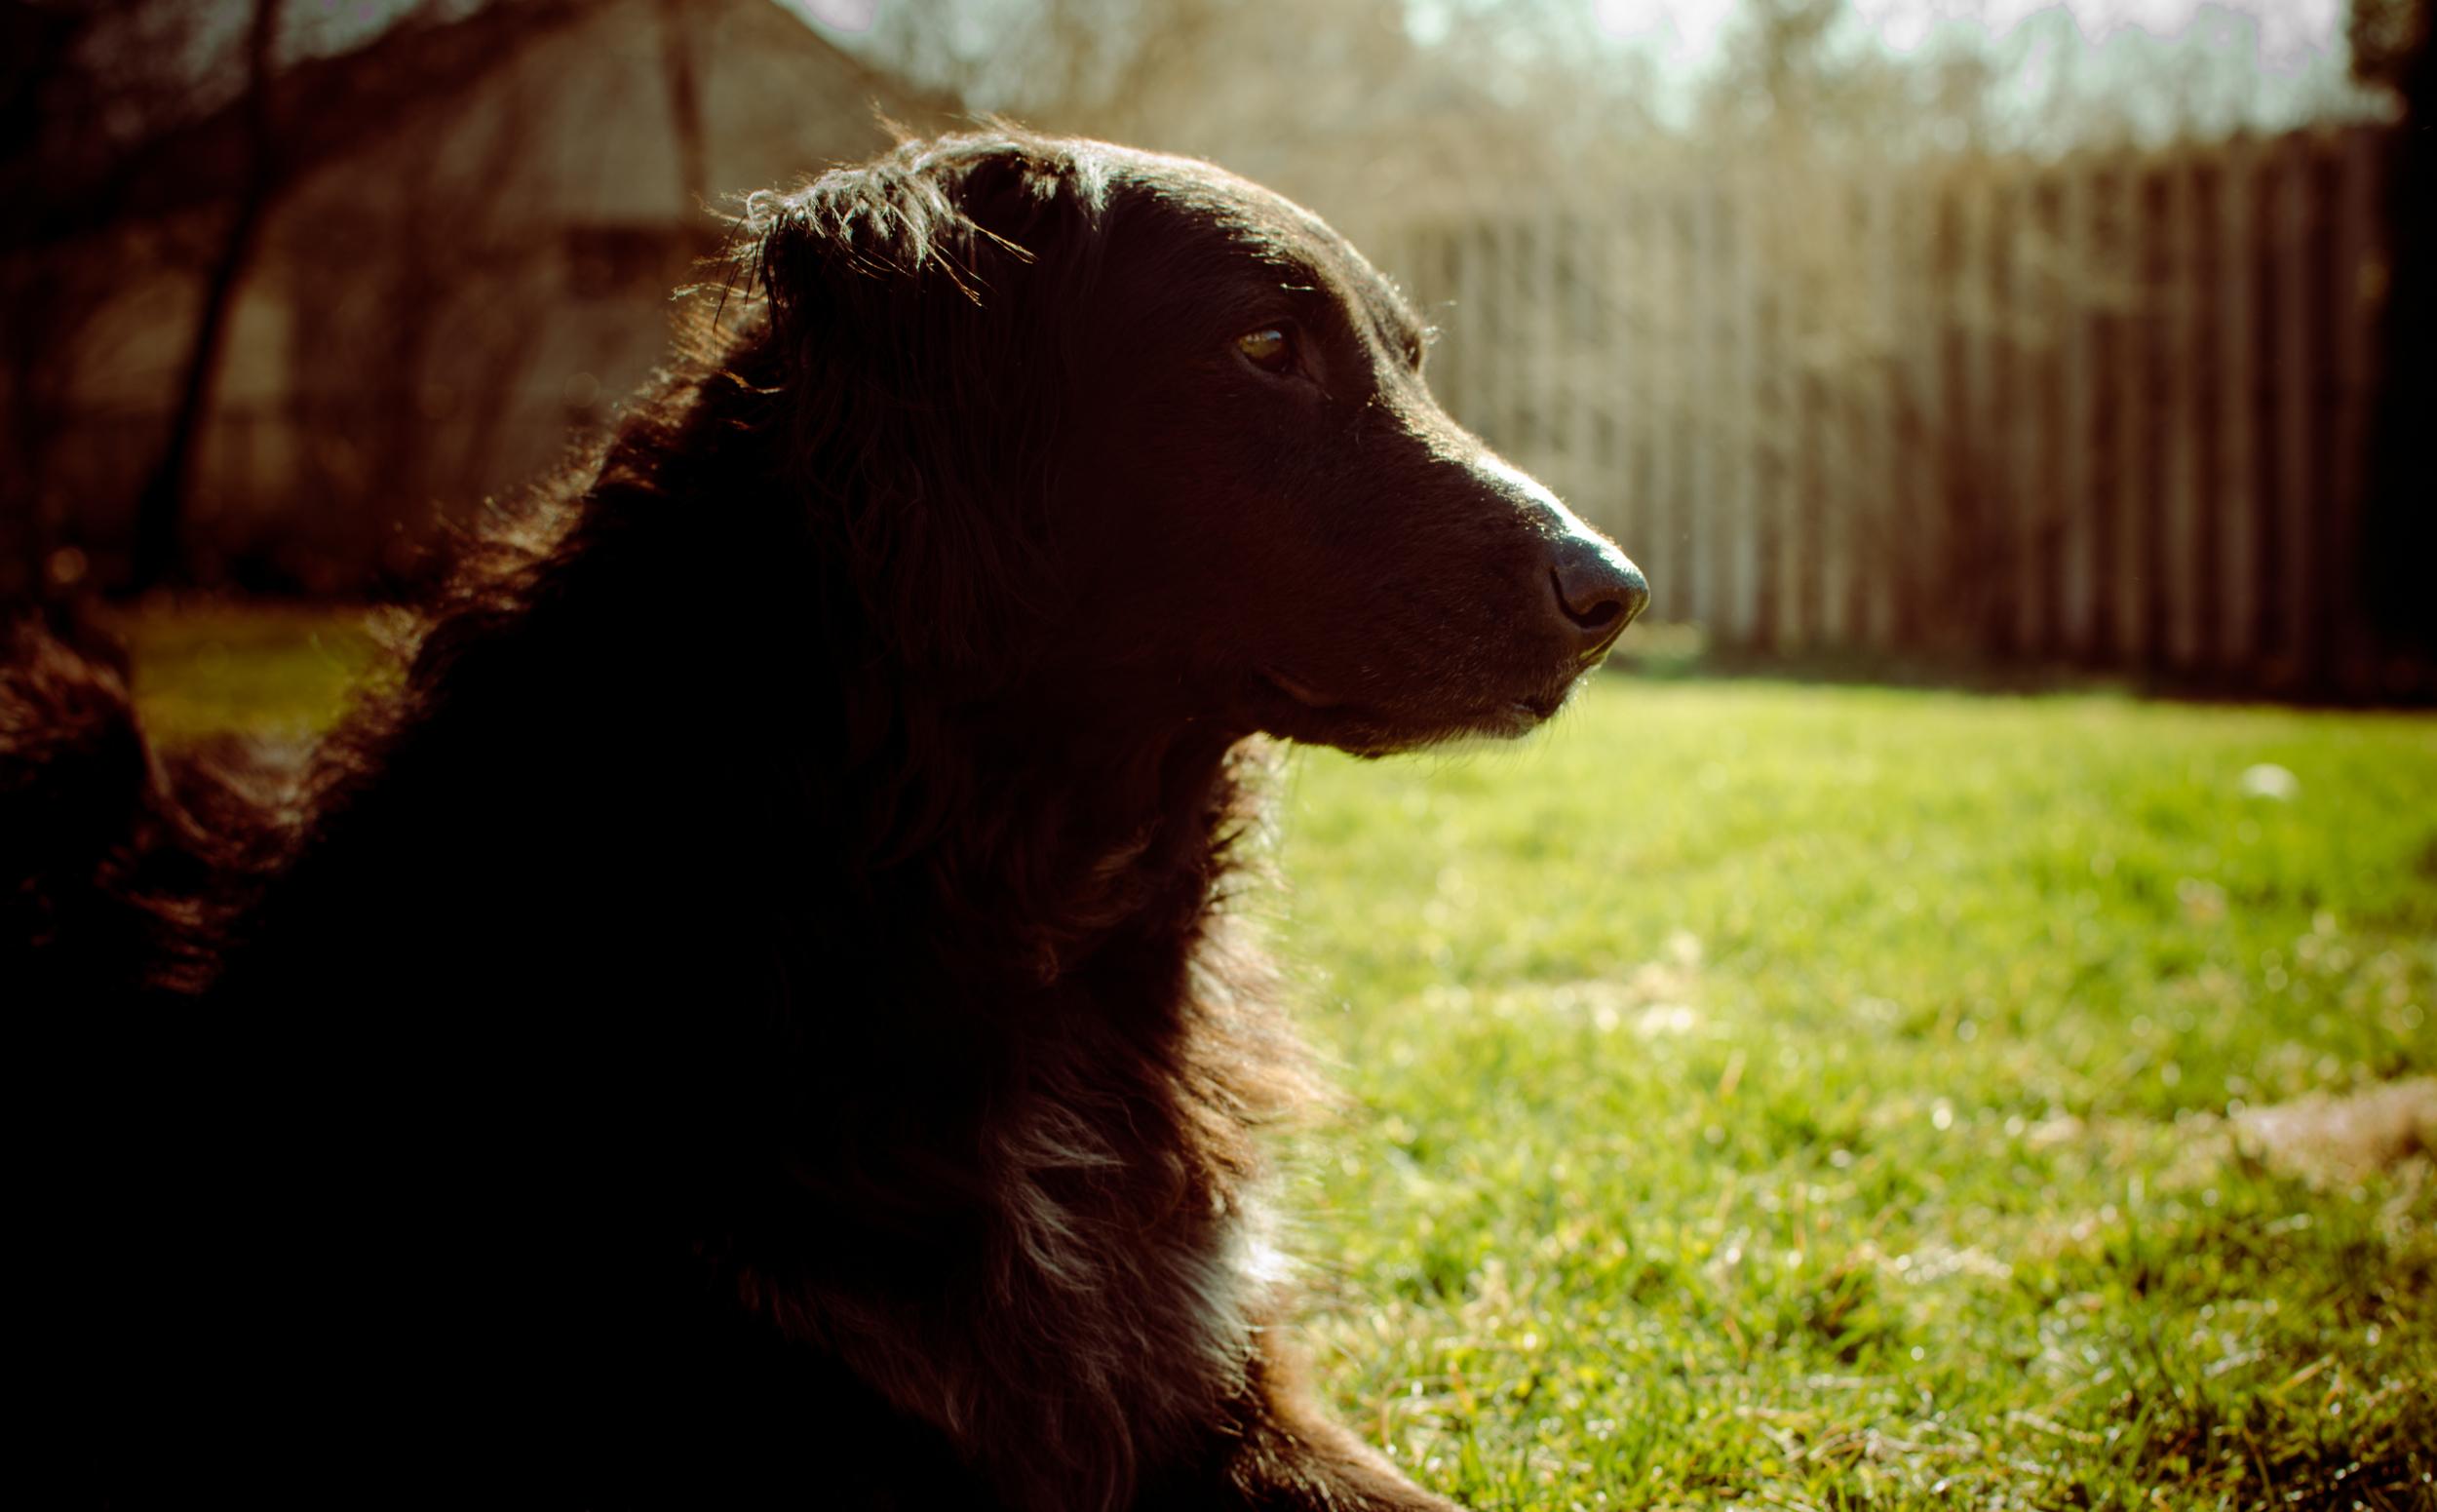 Abby, the hardest dog to photograph. Hopefully I've captured some of her strange personality!